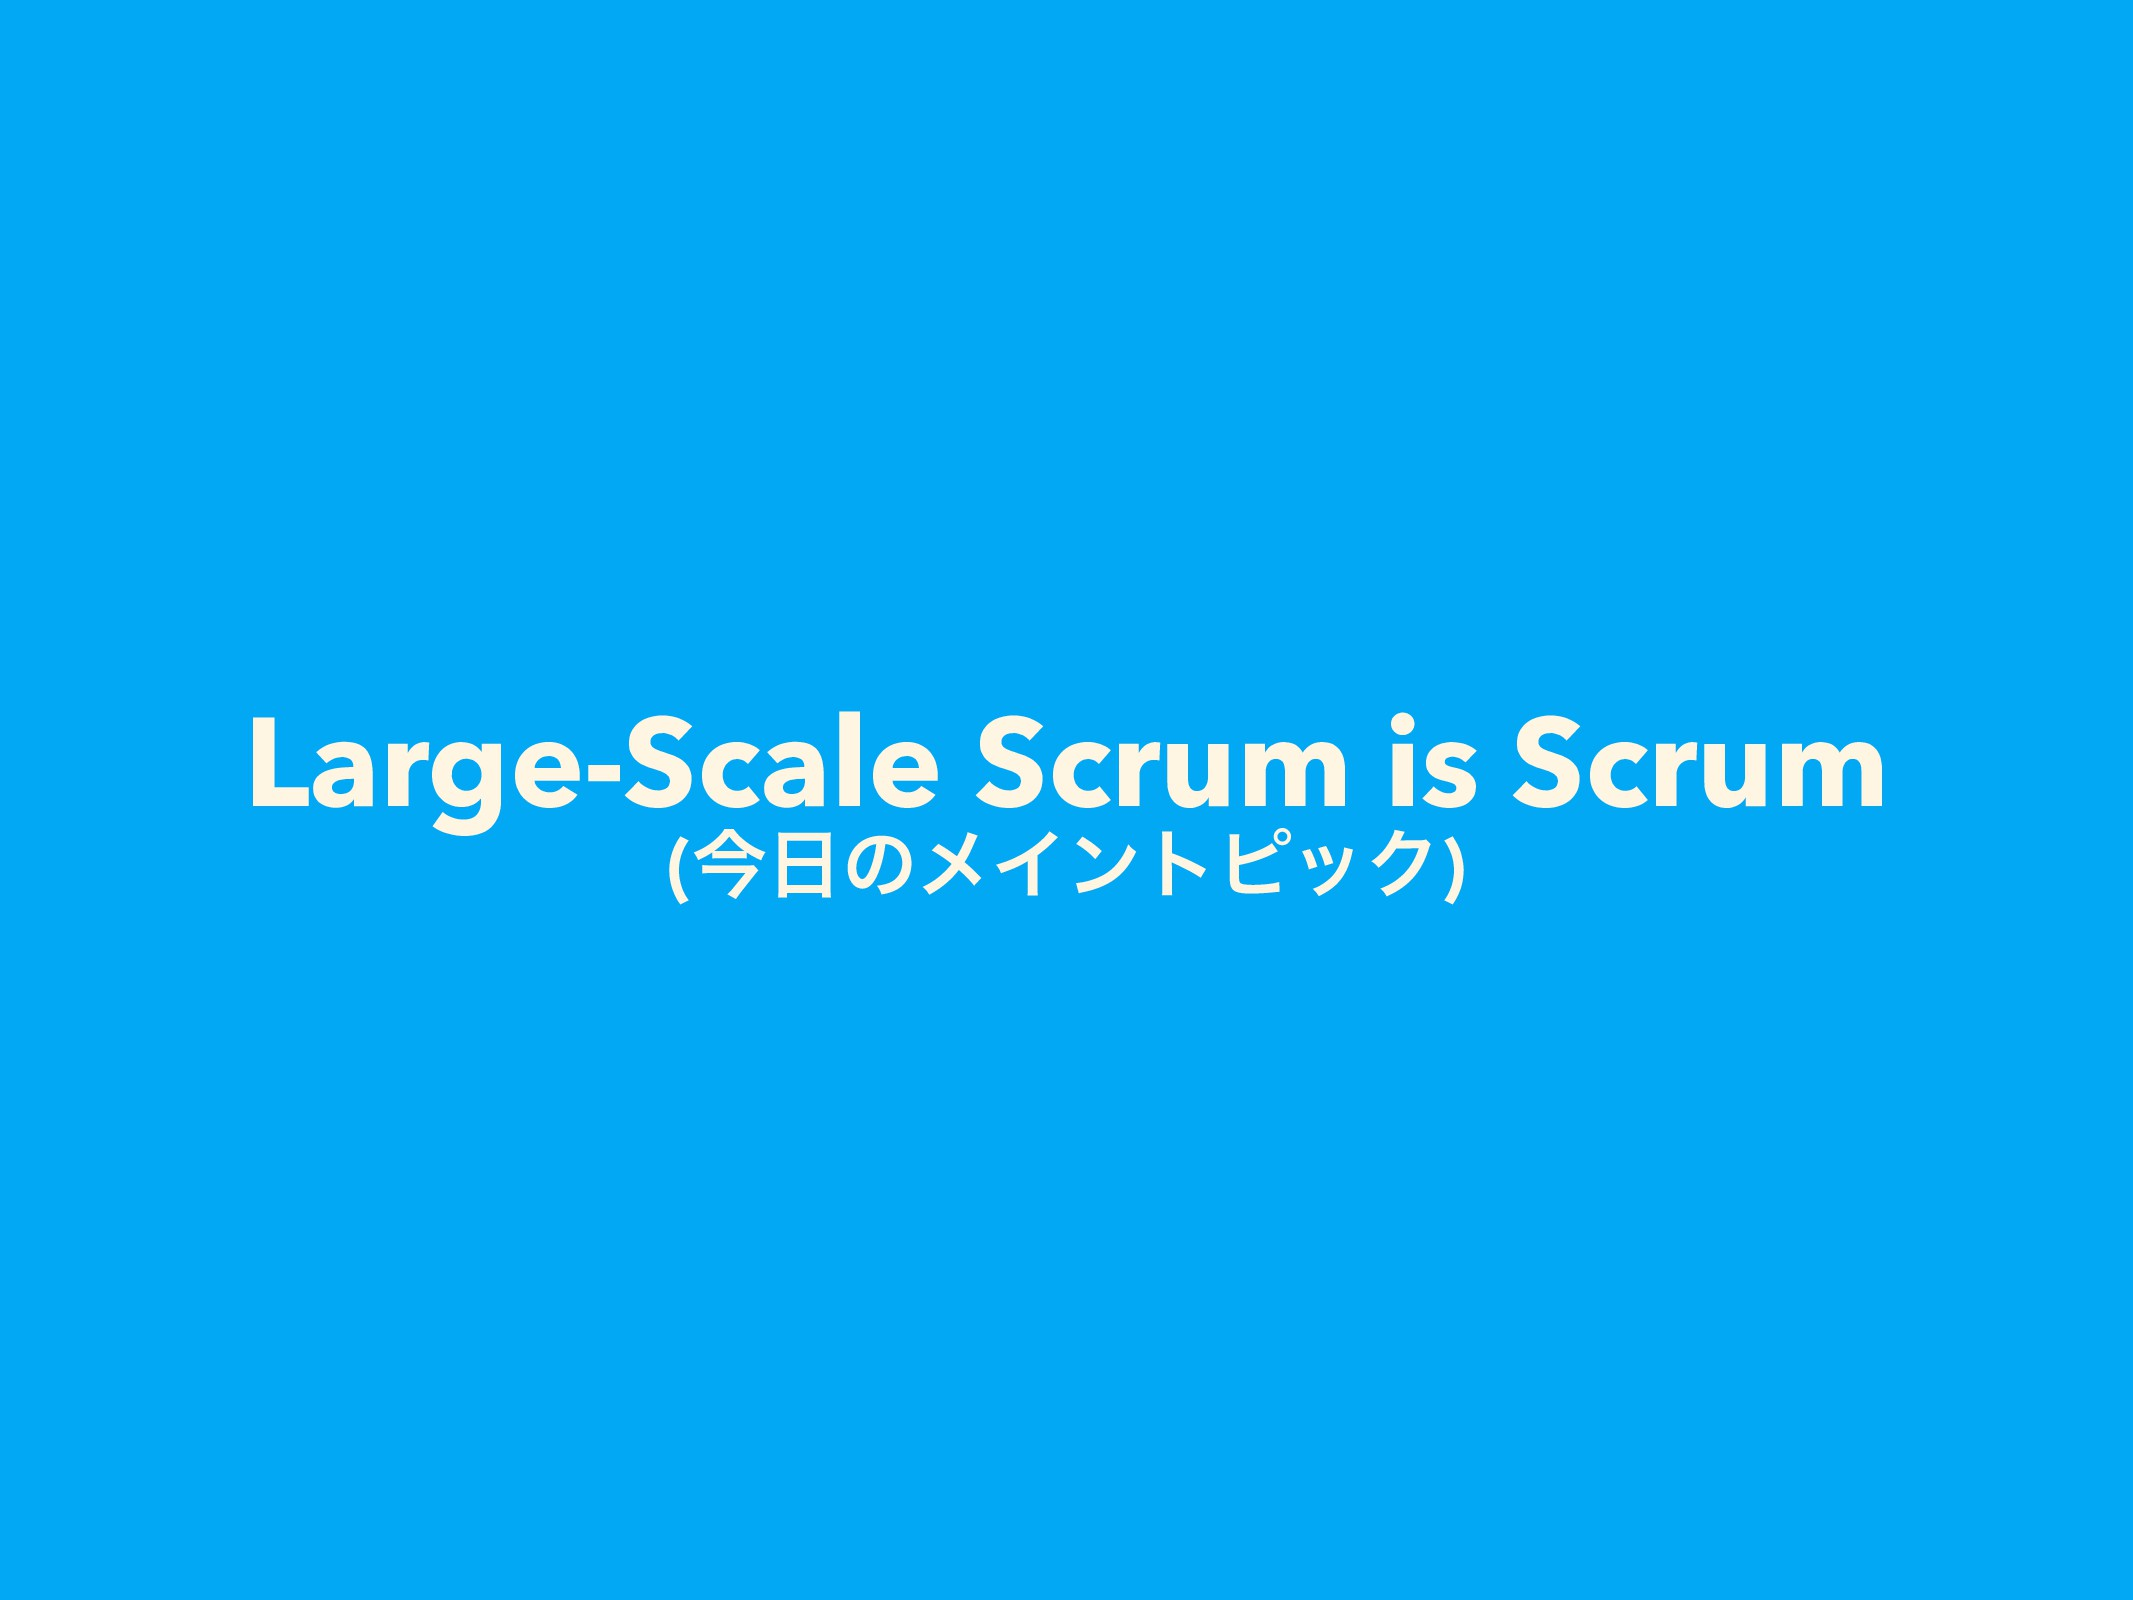 Large-Scale Scrum is Scrum (ࠓͷϝΠϯτϐοΫ)